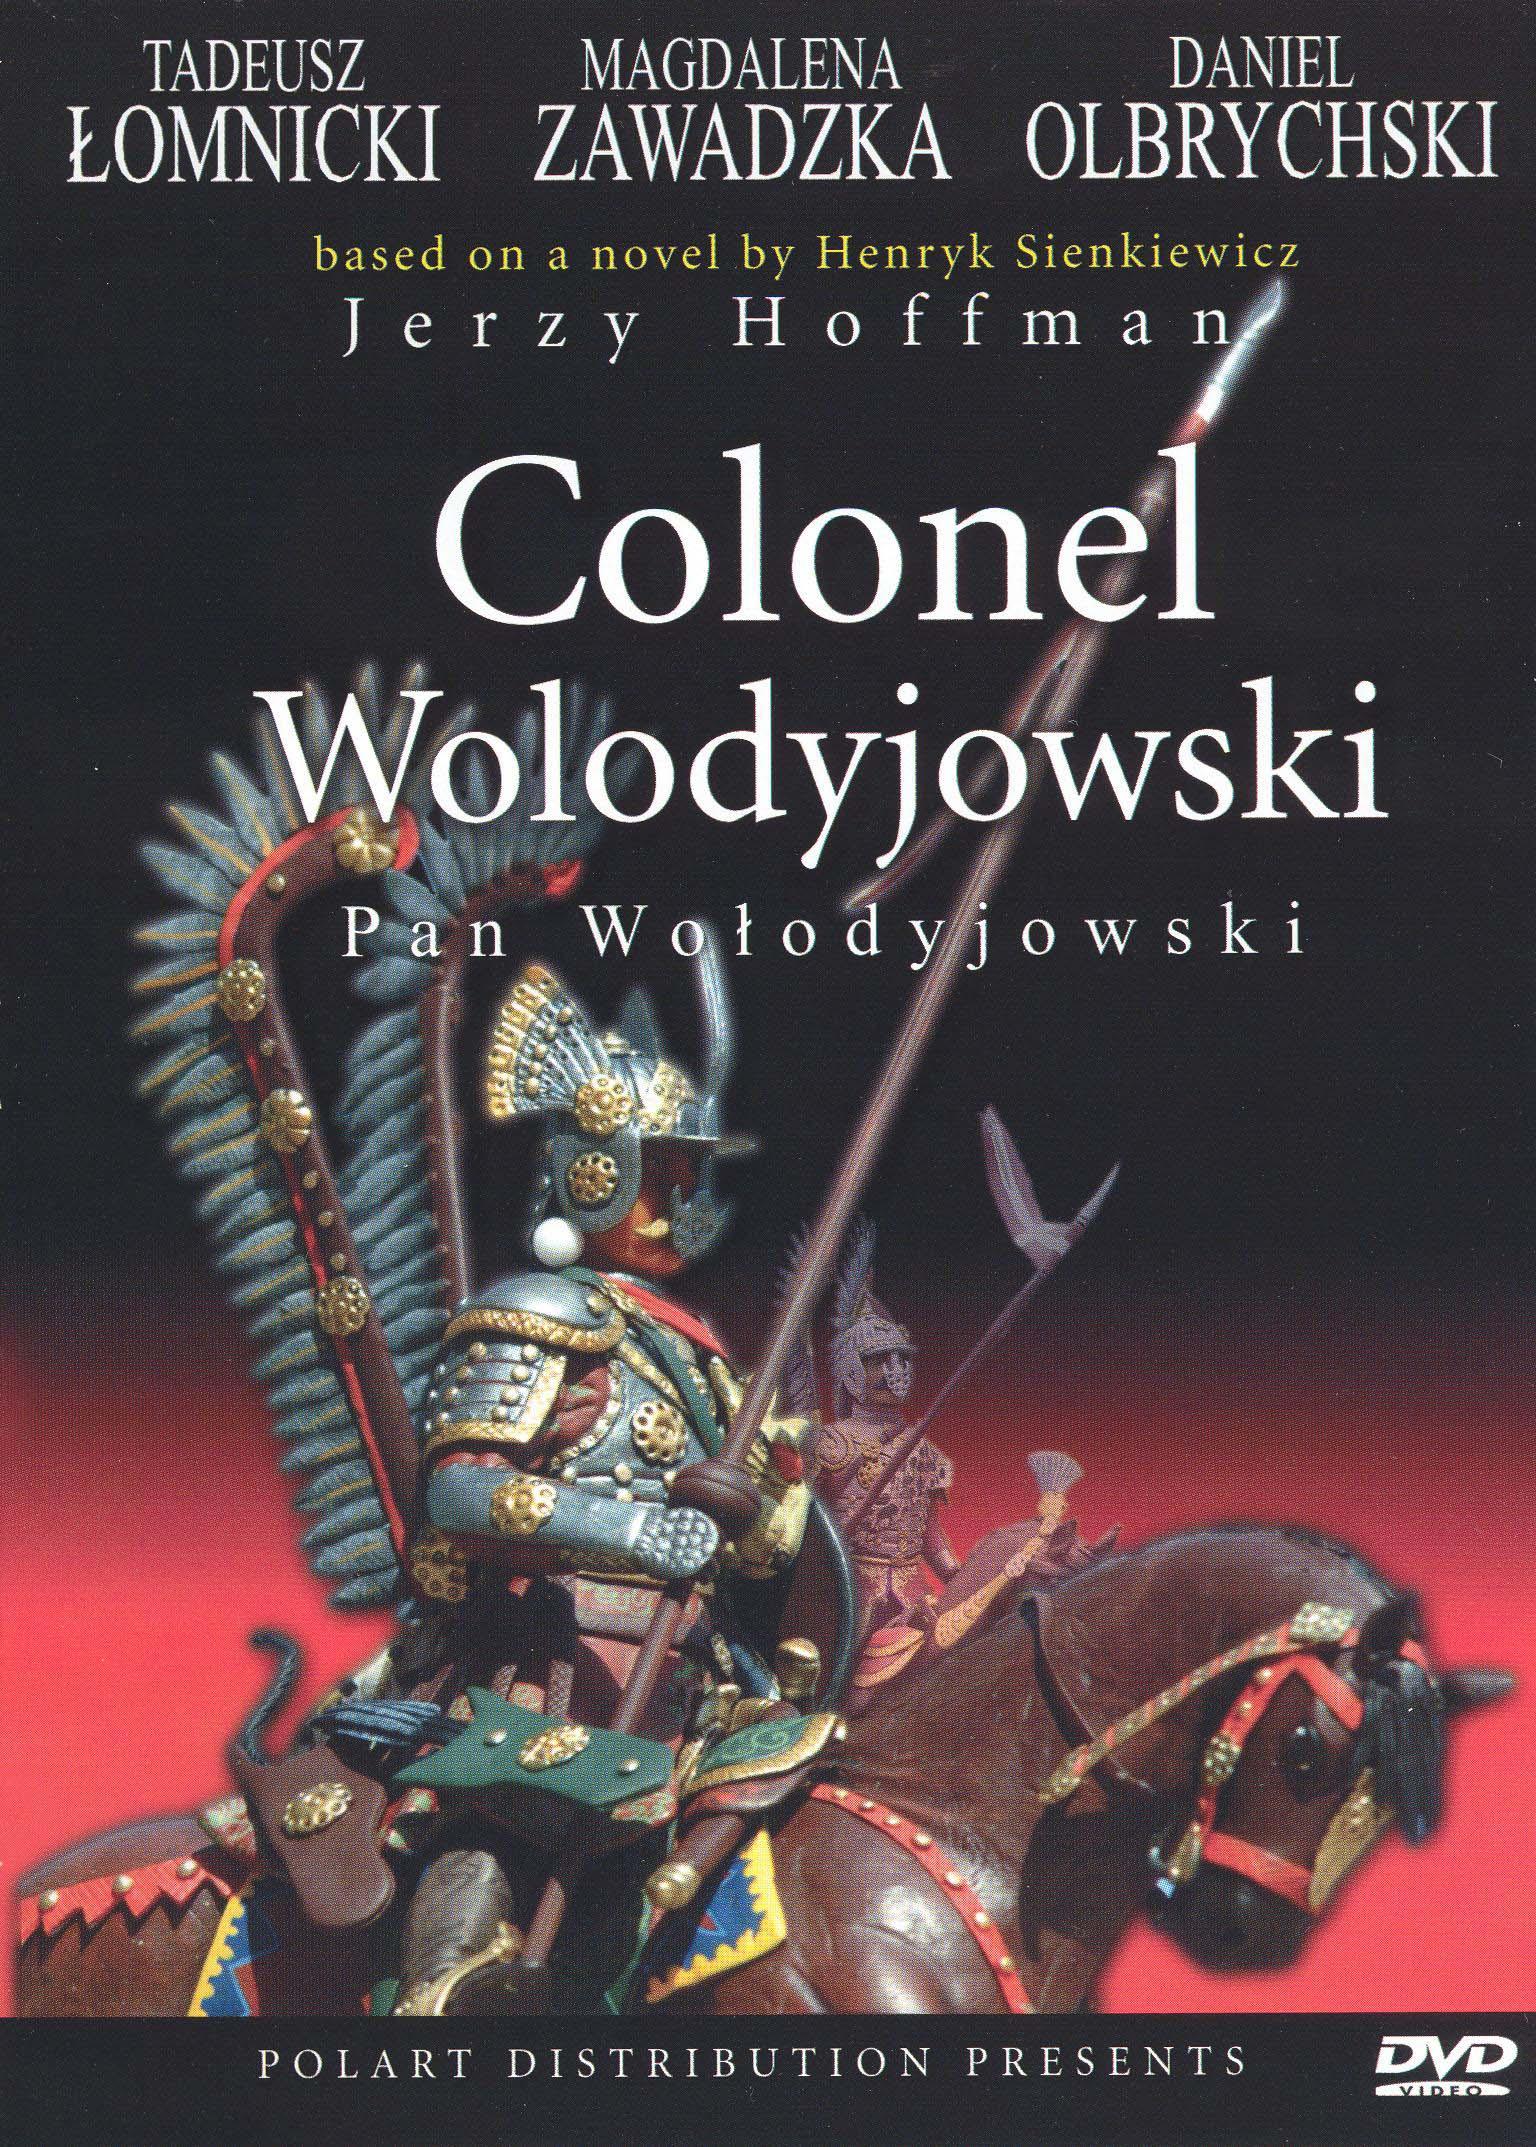 Colonel Wolodyjowski